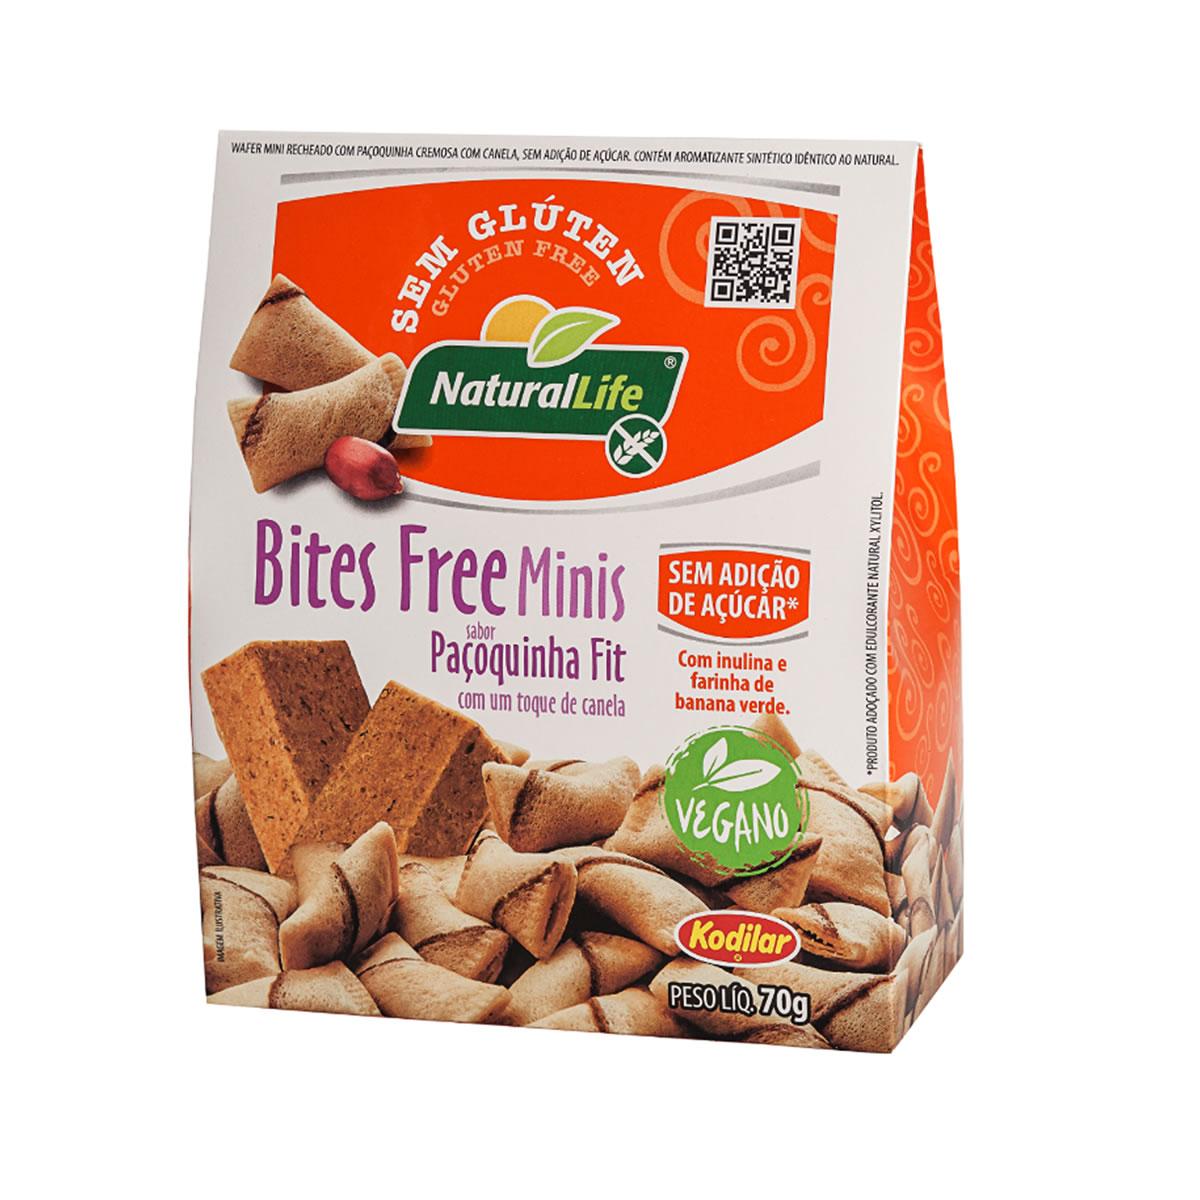 Bites Free Minis Sabor Paçoquinha Fit Sem Glúten Vegano 70g - NaturalLife